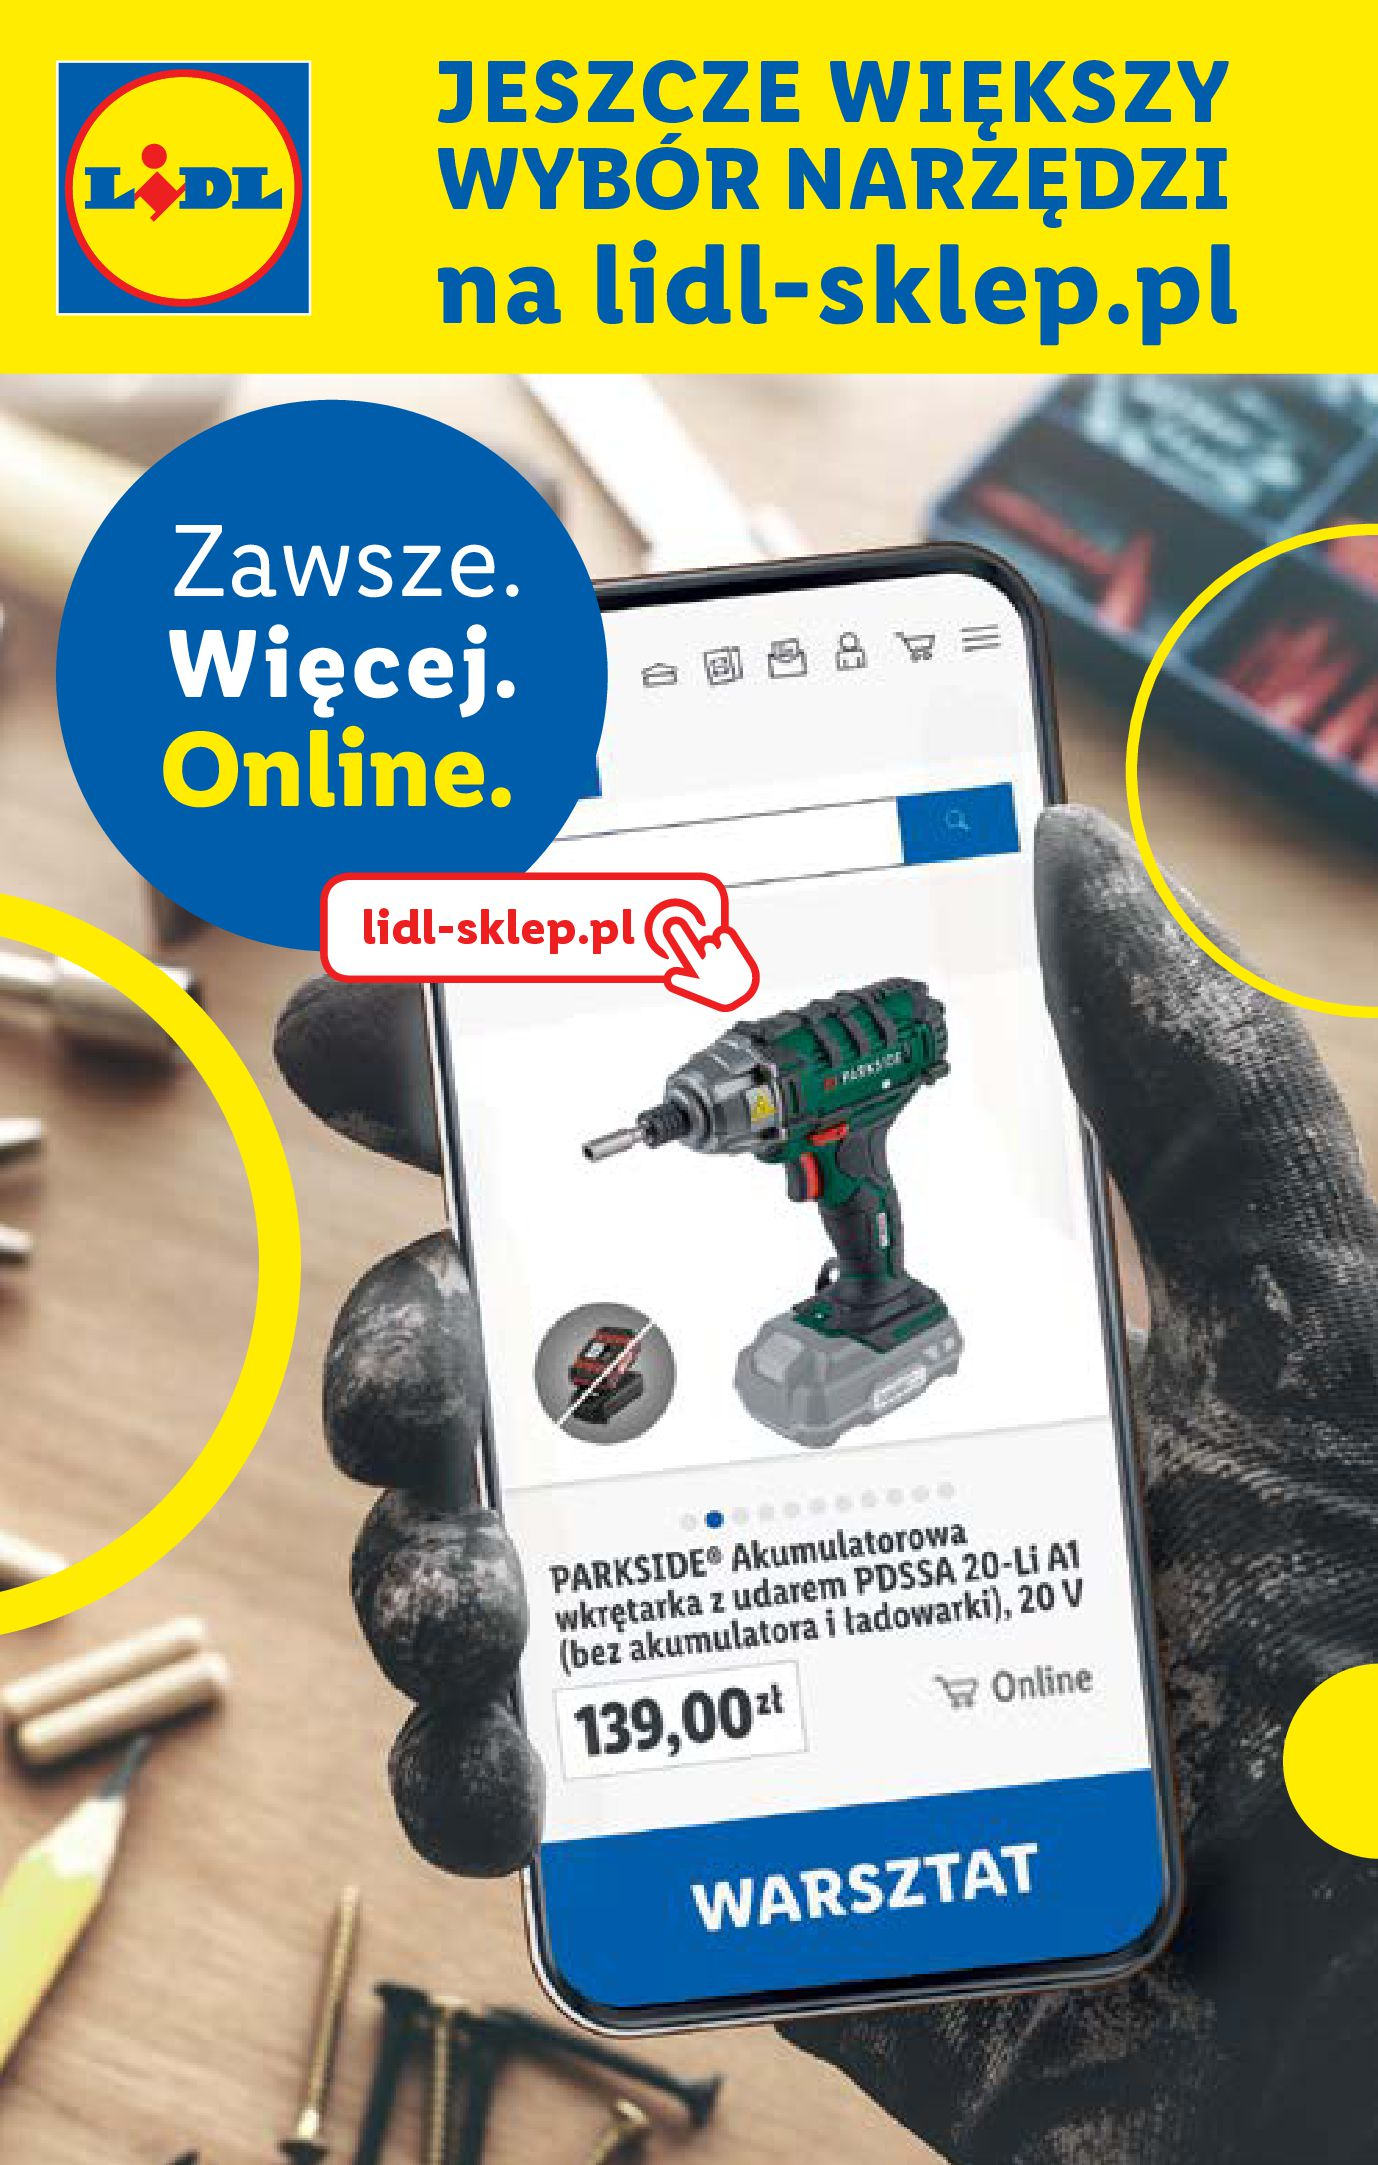 Gazetka Lidl - Katalog sklepu ONLINE-04.10.2020-31.10.2020-page-14